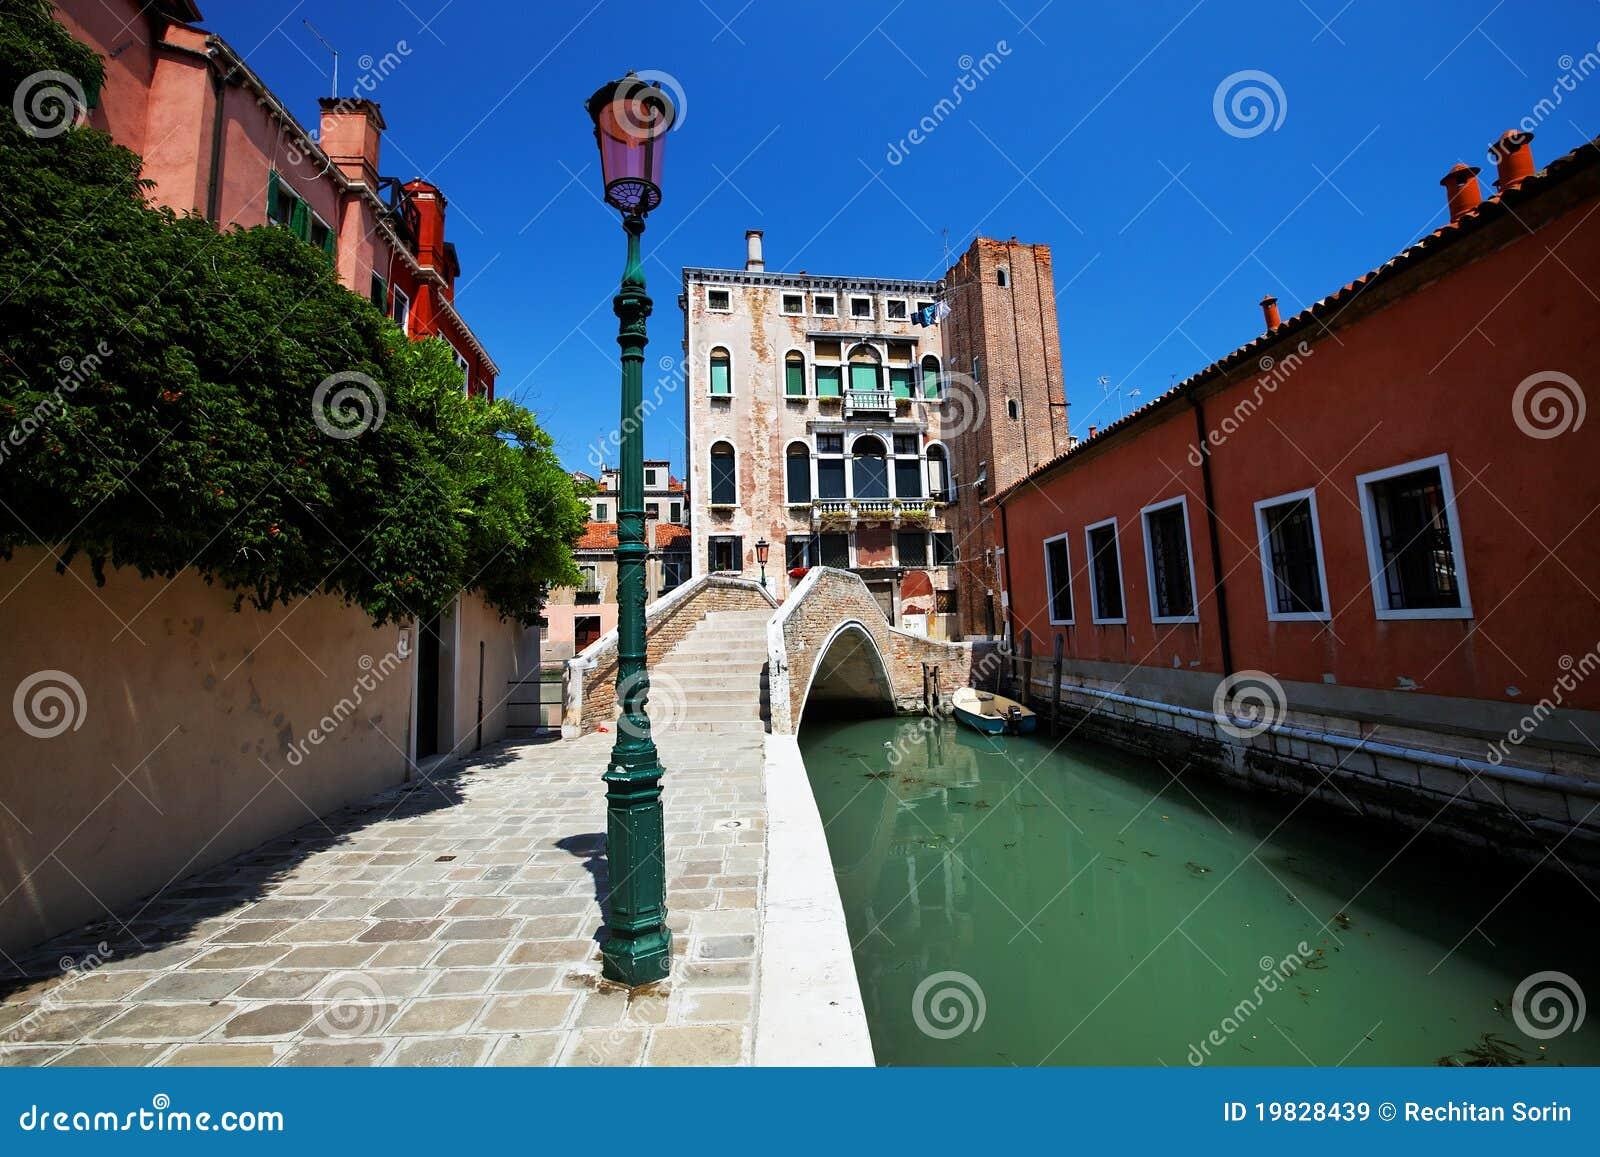 Architecturaal detail in Venetië